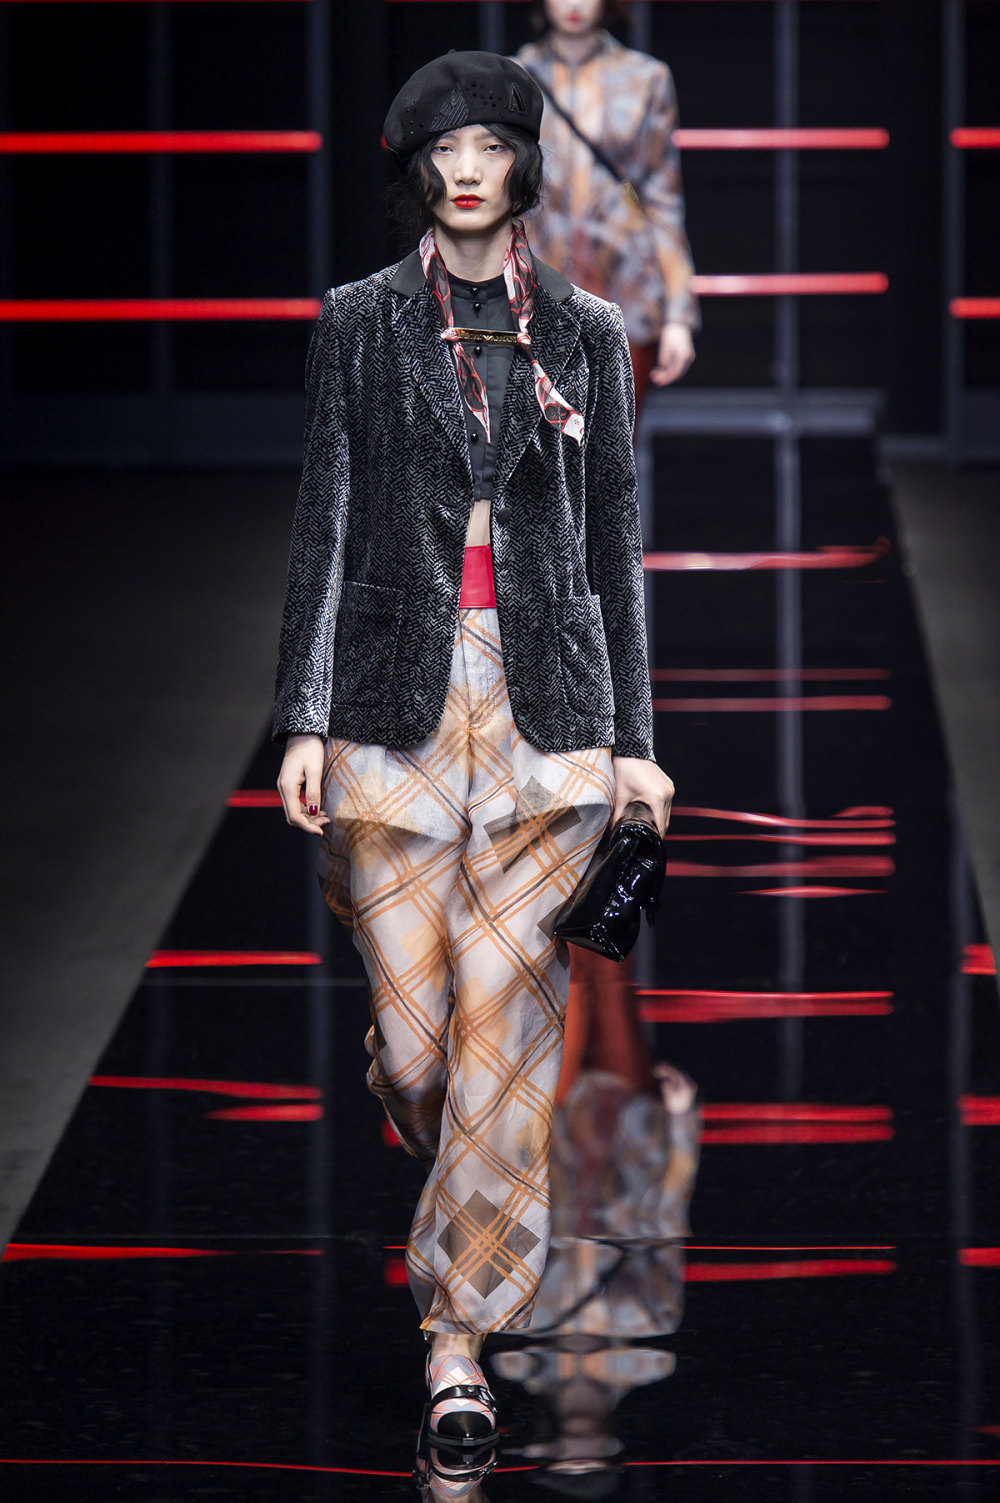 Emporio Armani时装系列畅的裤子带有柔滑裙子的鸡尾酒礼服-13.jpg